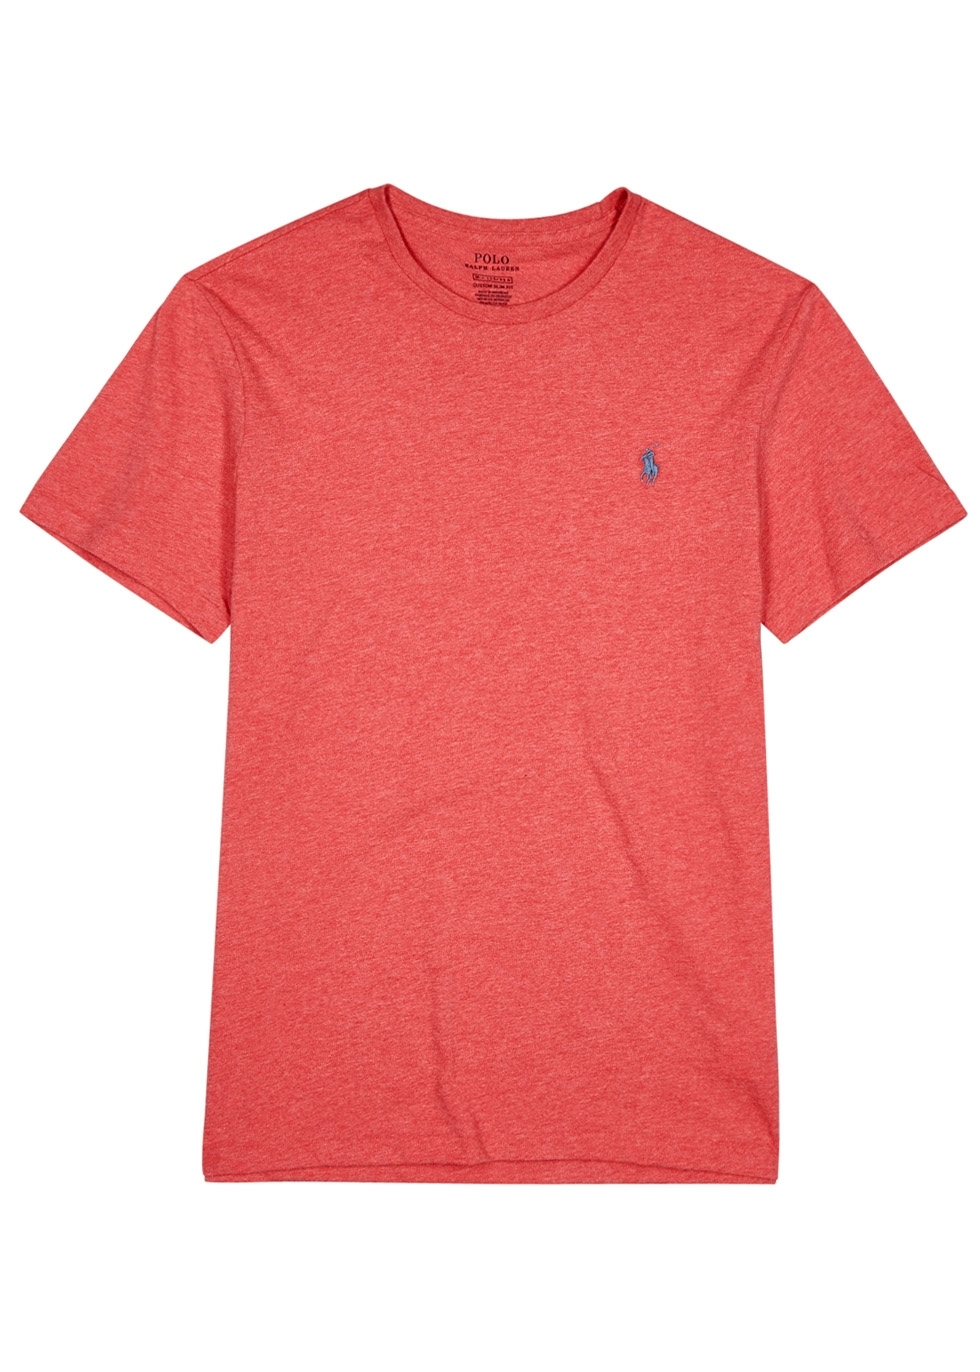 Polo ralph lauren logo embroidered cotton t shirt harvey